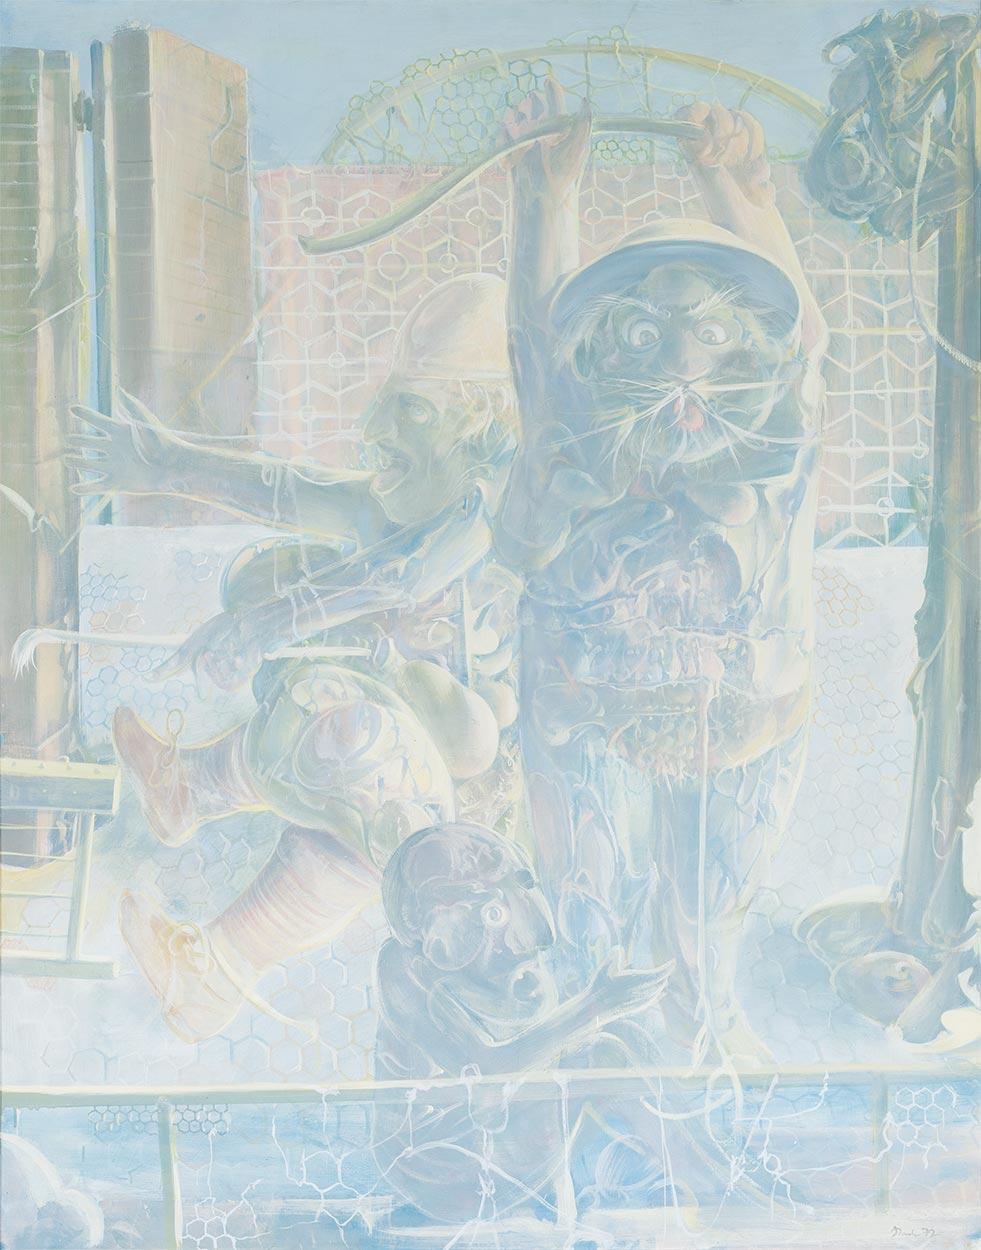 Dado: Rhinoceros, third panel, 1972